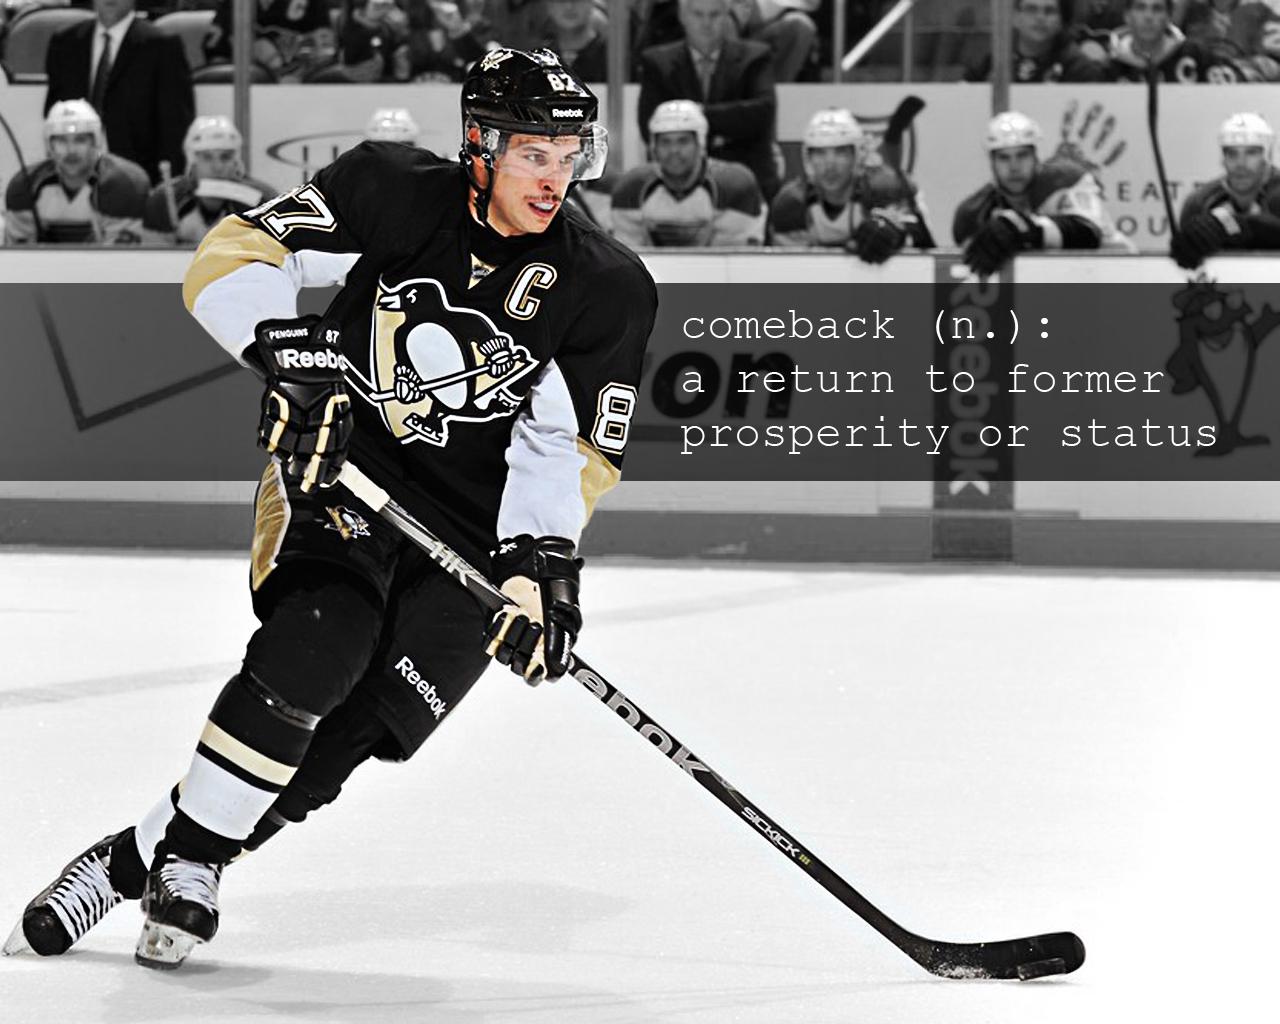 Sidney Crosby Comeback Wallpaper 1280x1024